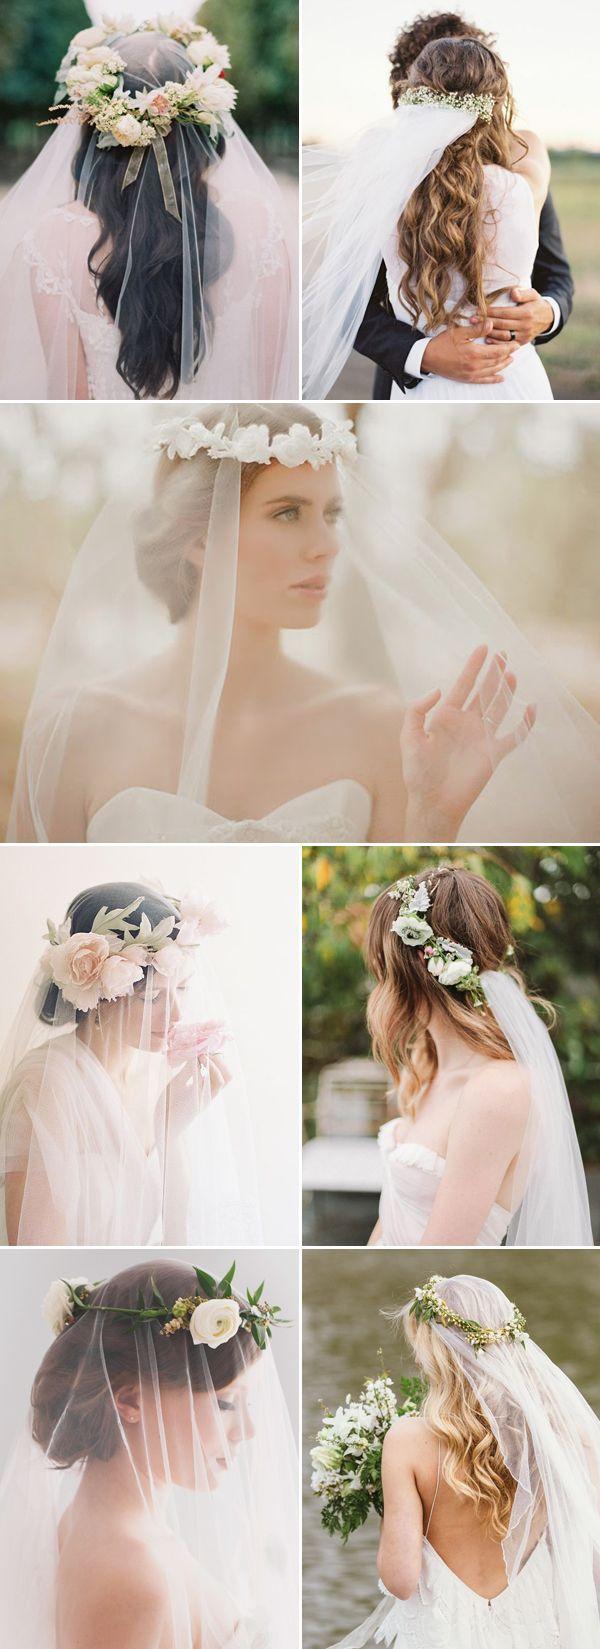 ebf07967c velos de novia con coronas de flores